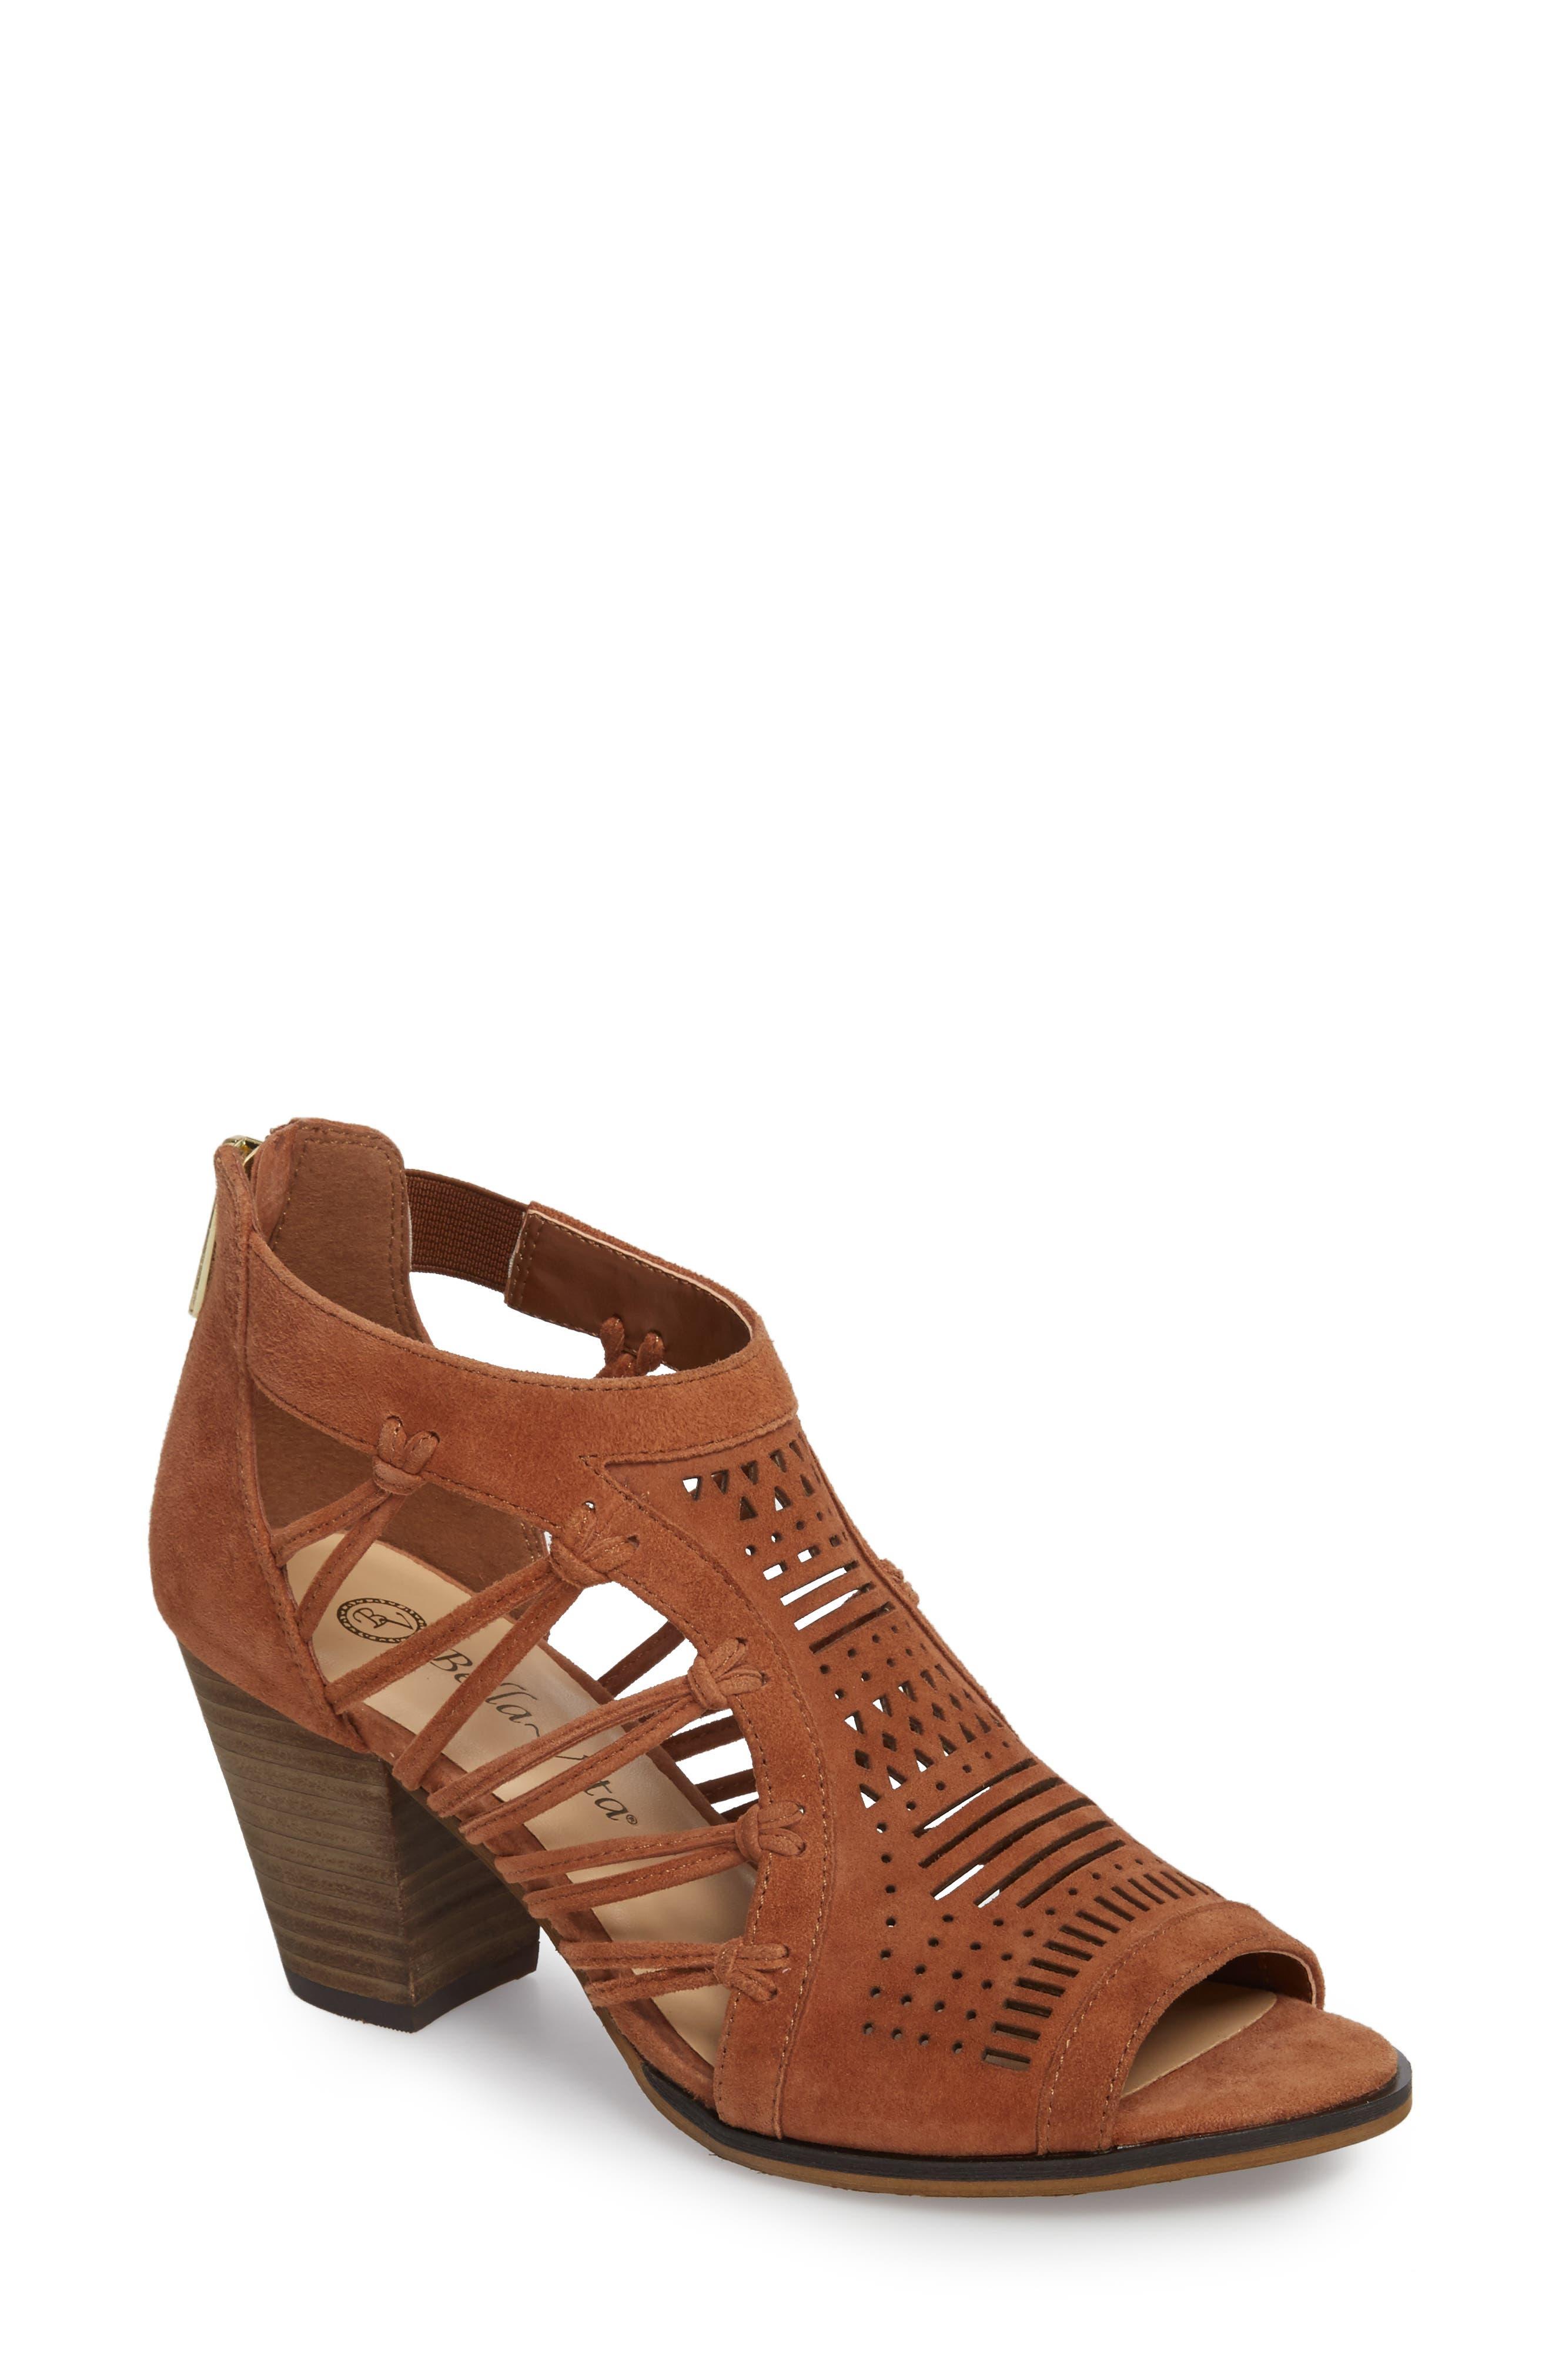 Kortez Block Heel Sandal,                             Main thumbnail 1, color,                             Dark Tan Suede